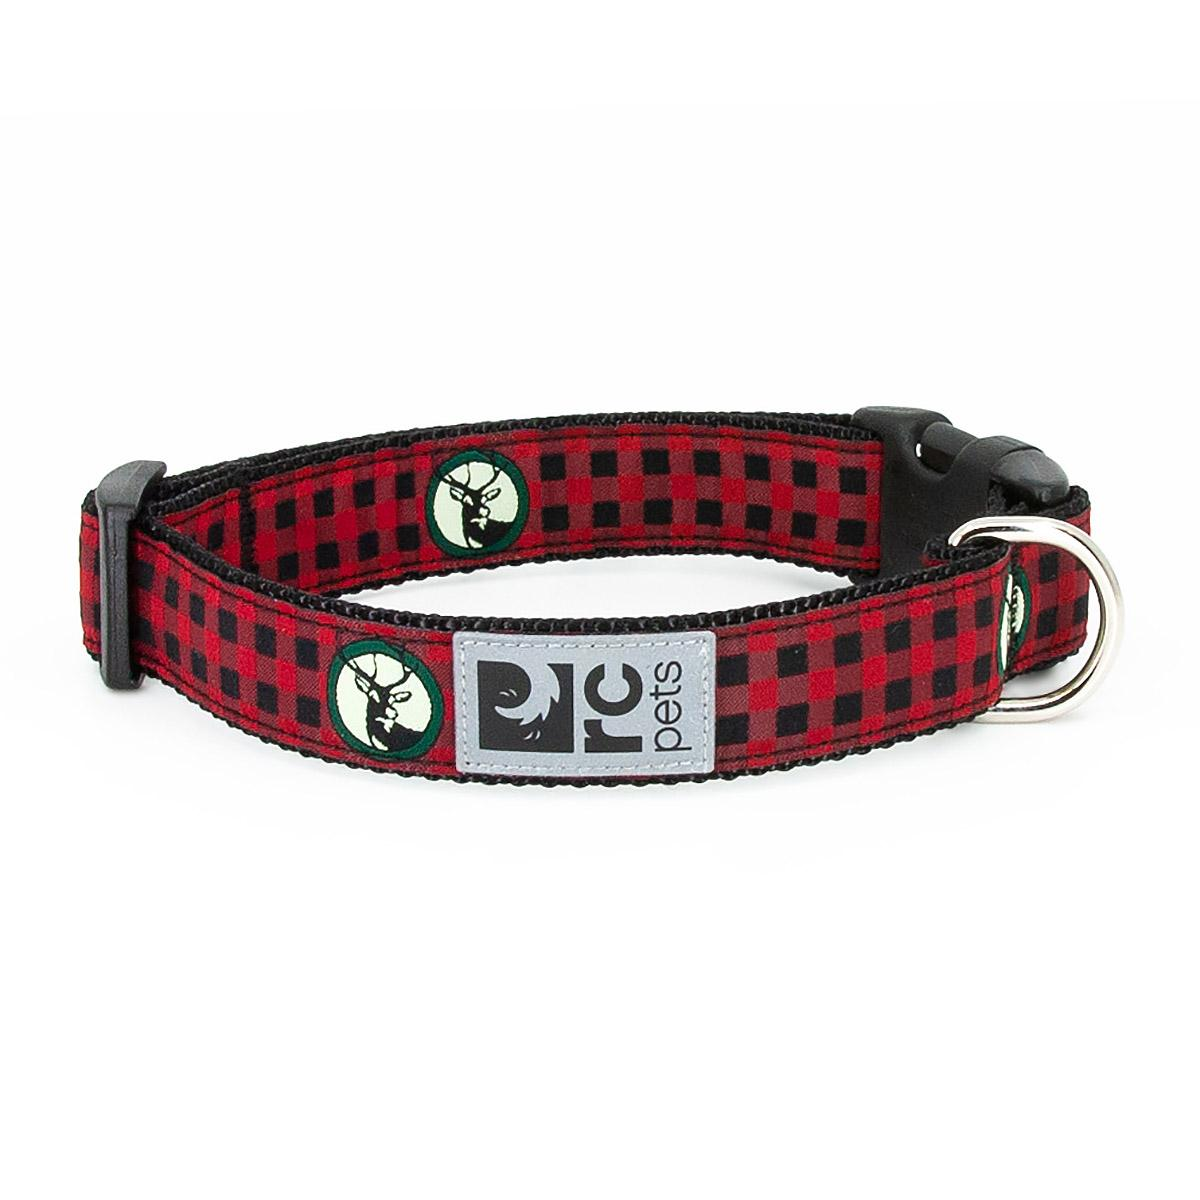 Urban Woodsman Adjustable Clip Dog Collar by RC Pet